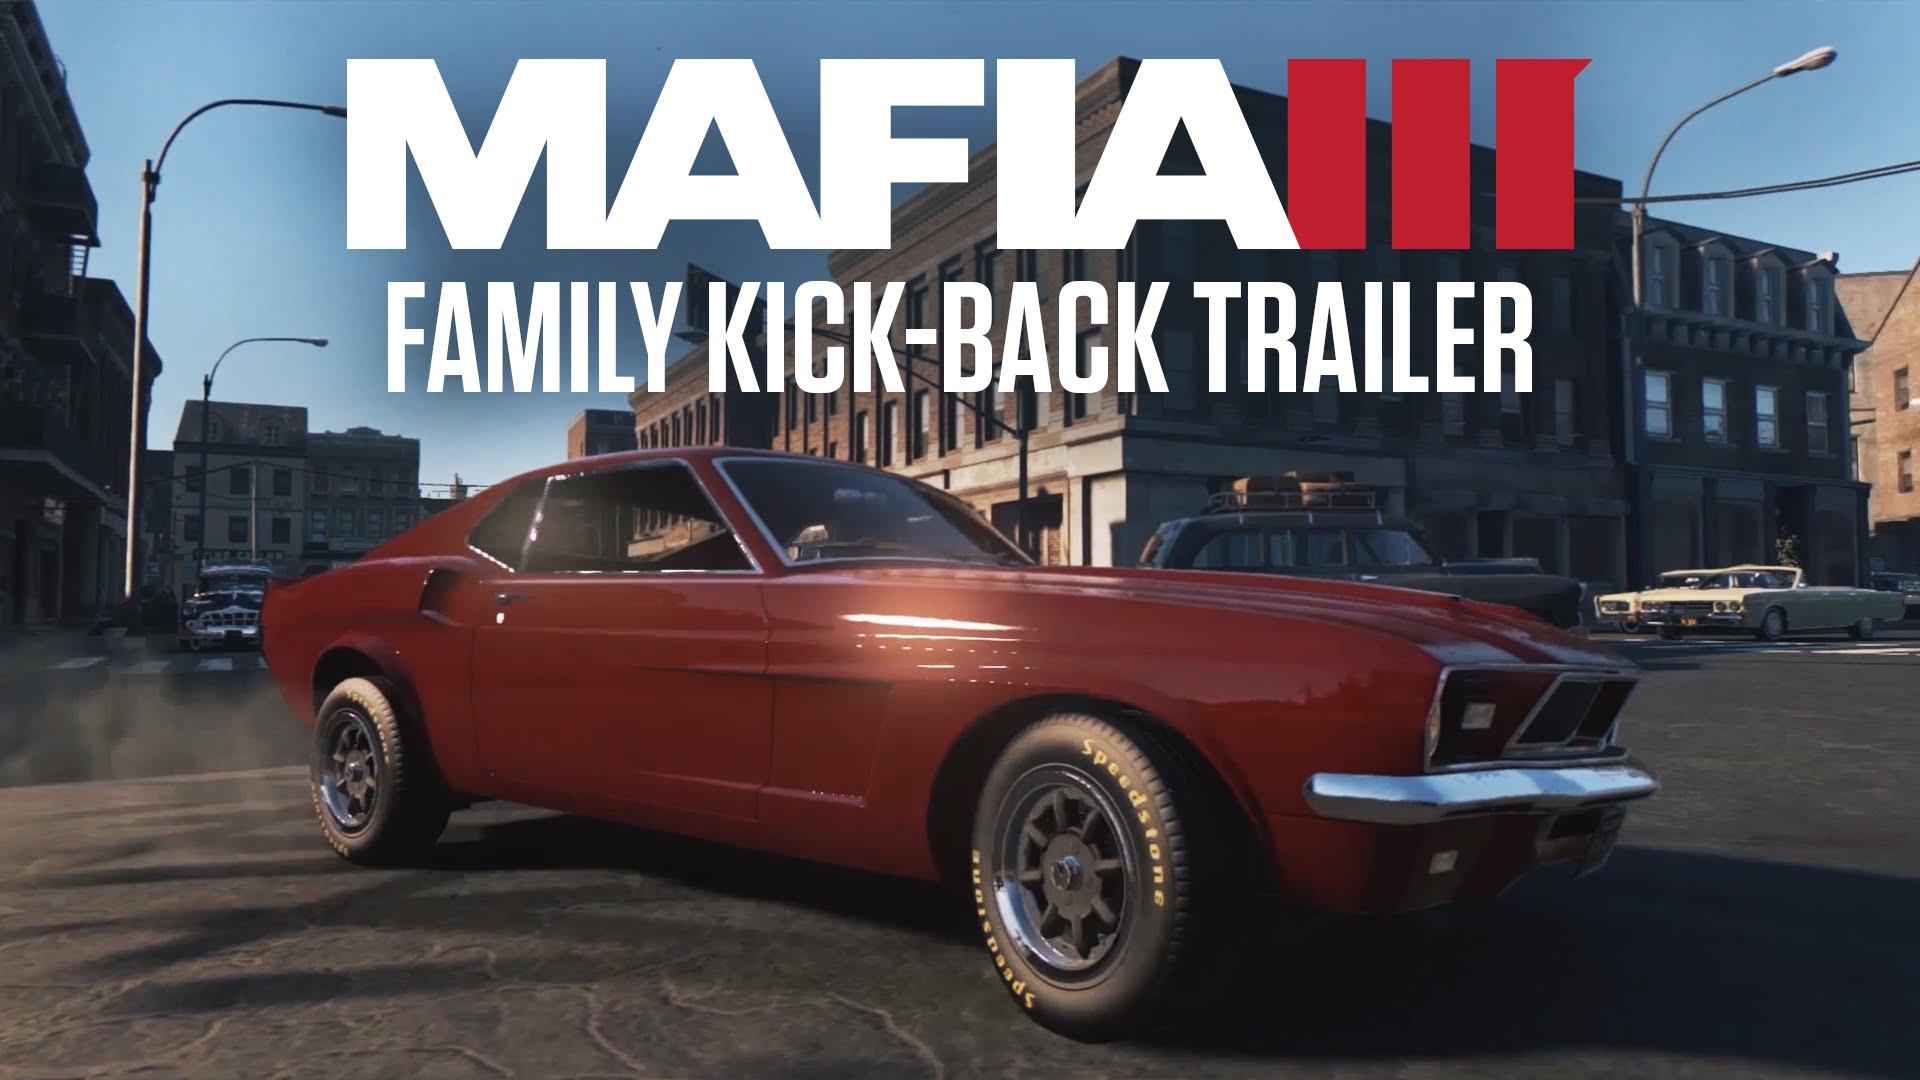 Mafia III Family Kick-Back Trailer